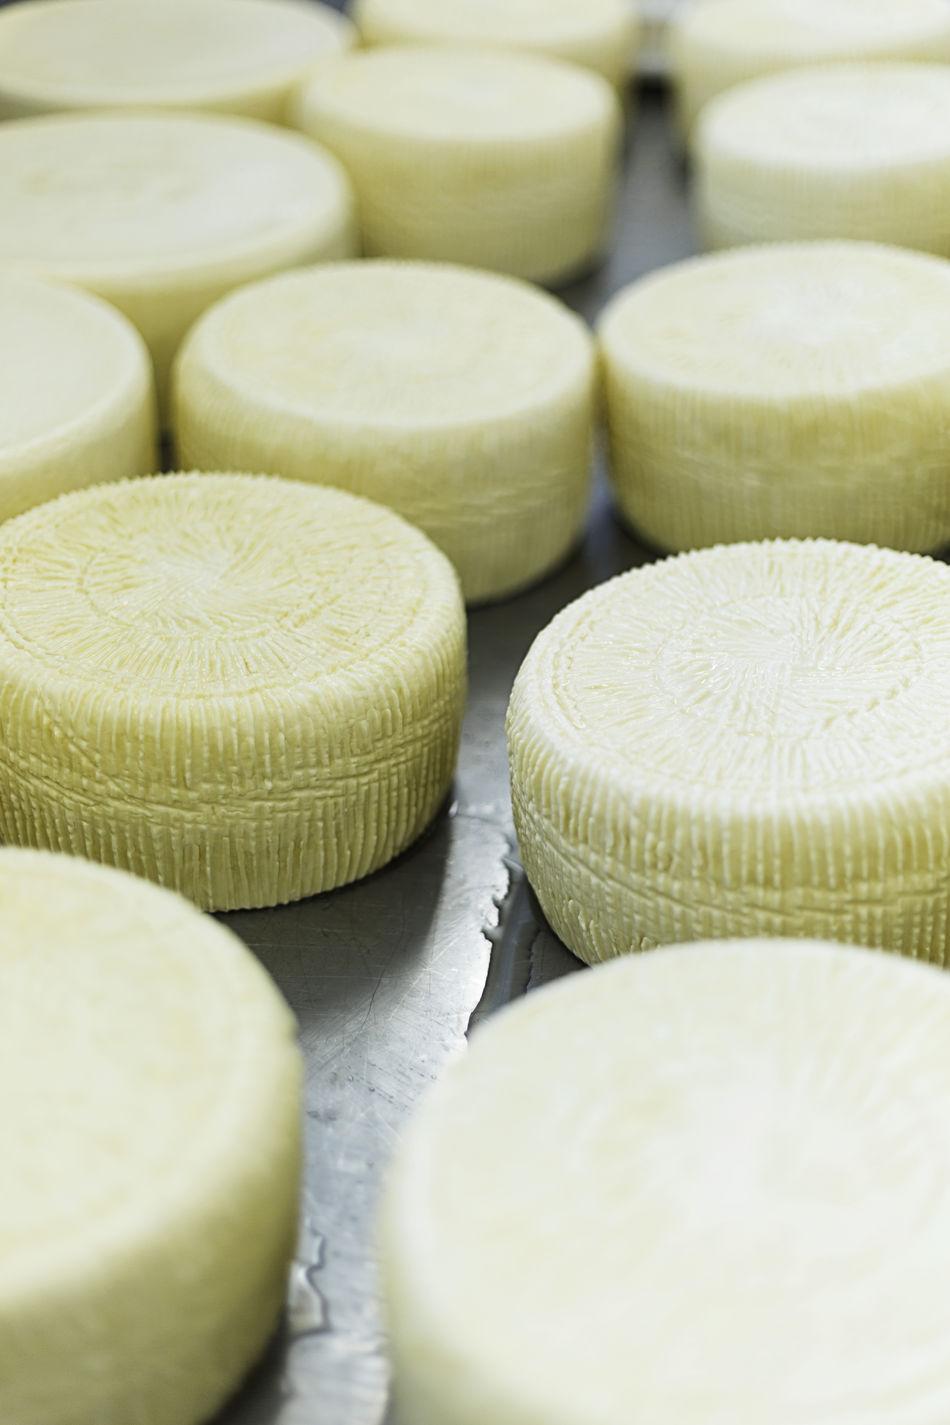 Cheese Dairy Dairy Farm Fresh Cheese  Italian Italian Cheese Italian Food Italy Making Making Cheese Milk Mozzarella Ricotta Ricotta Cheese